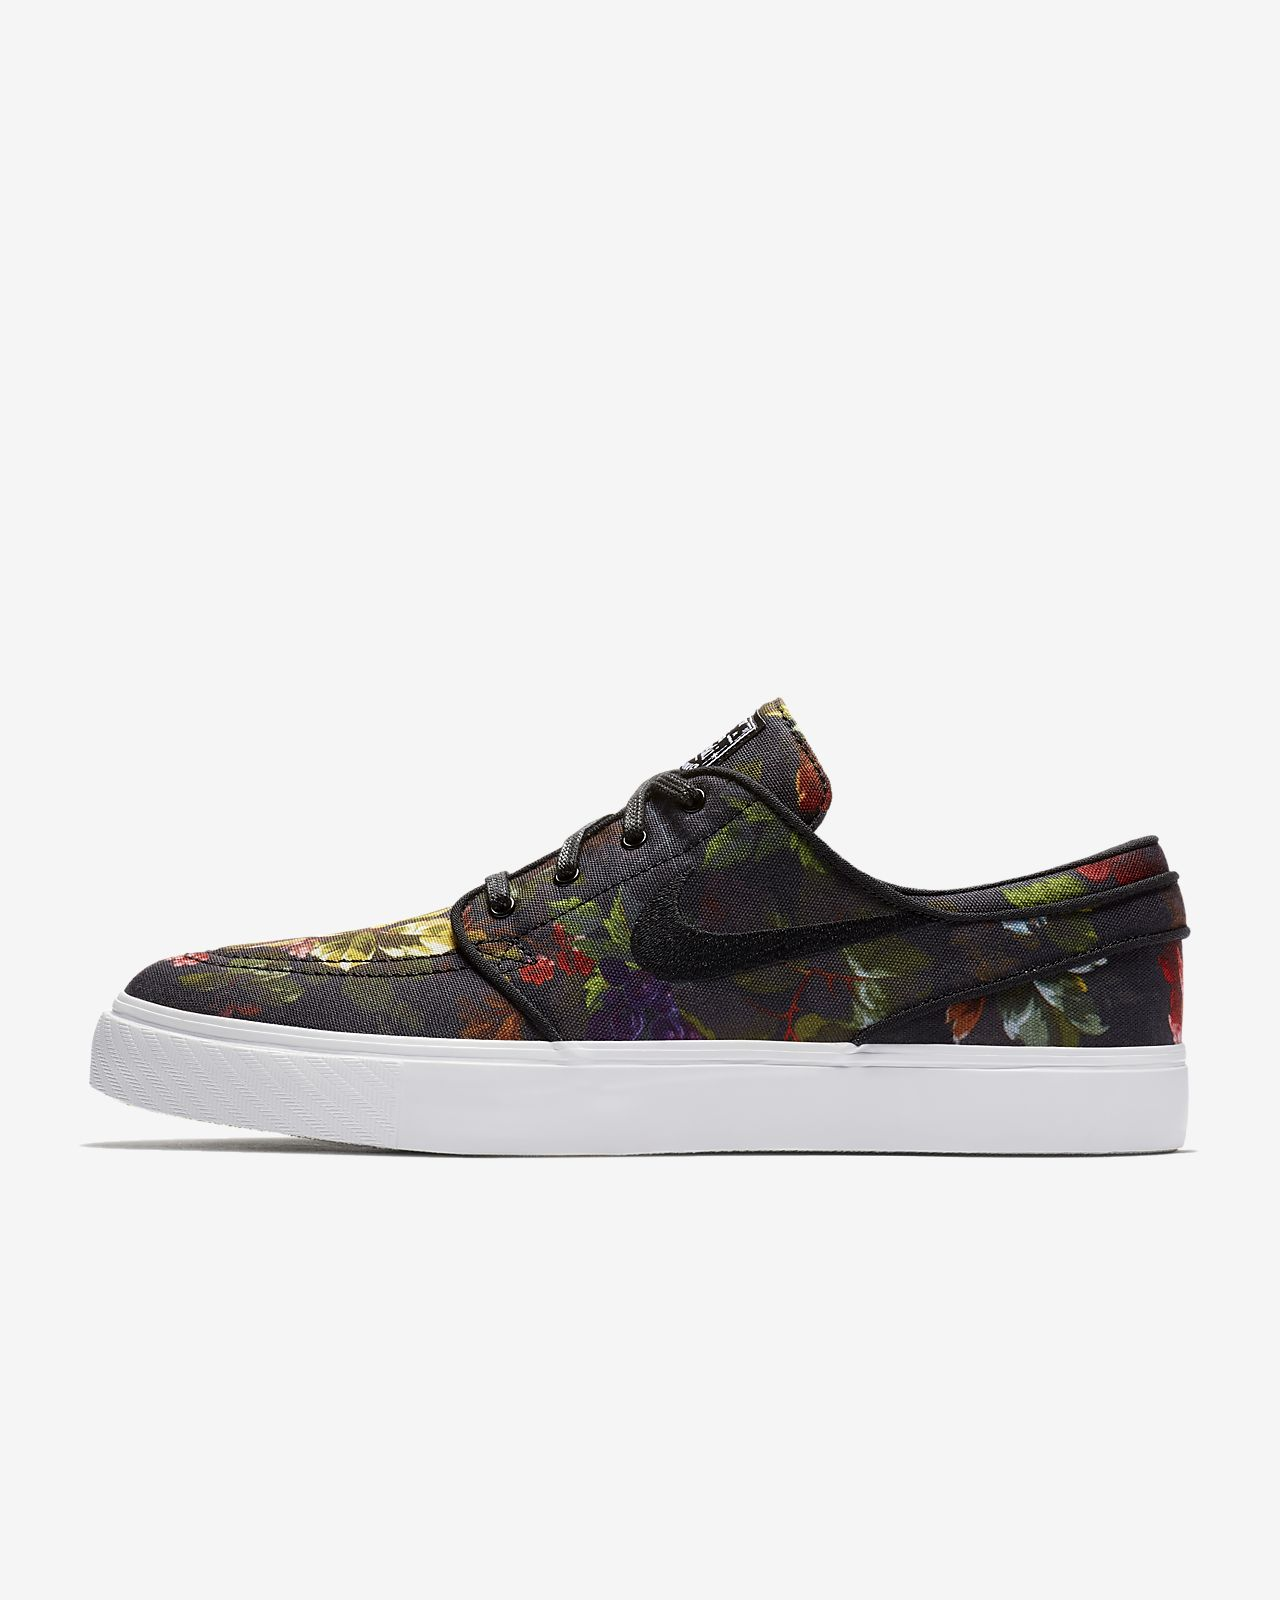 günstig Nike Zoom Stefan Janoski CNVS Schuhe Herren